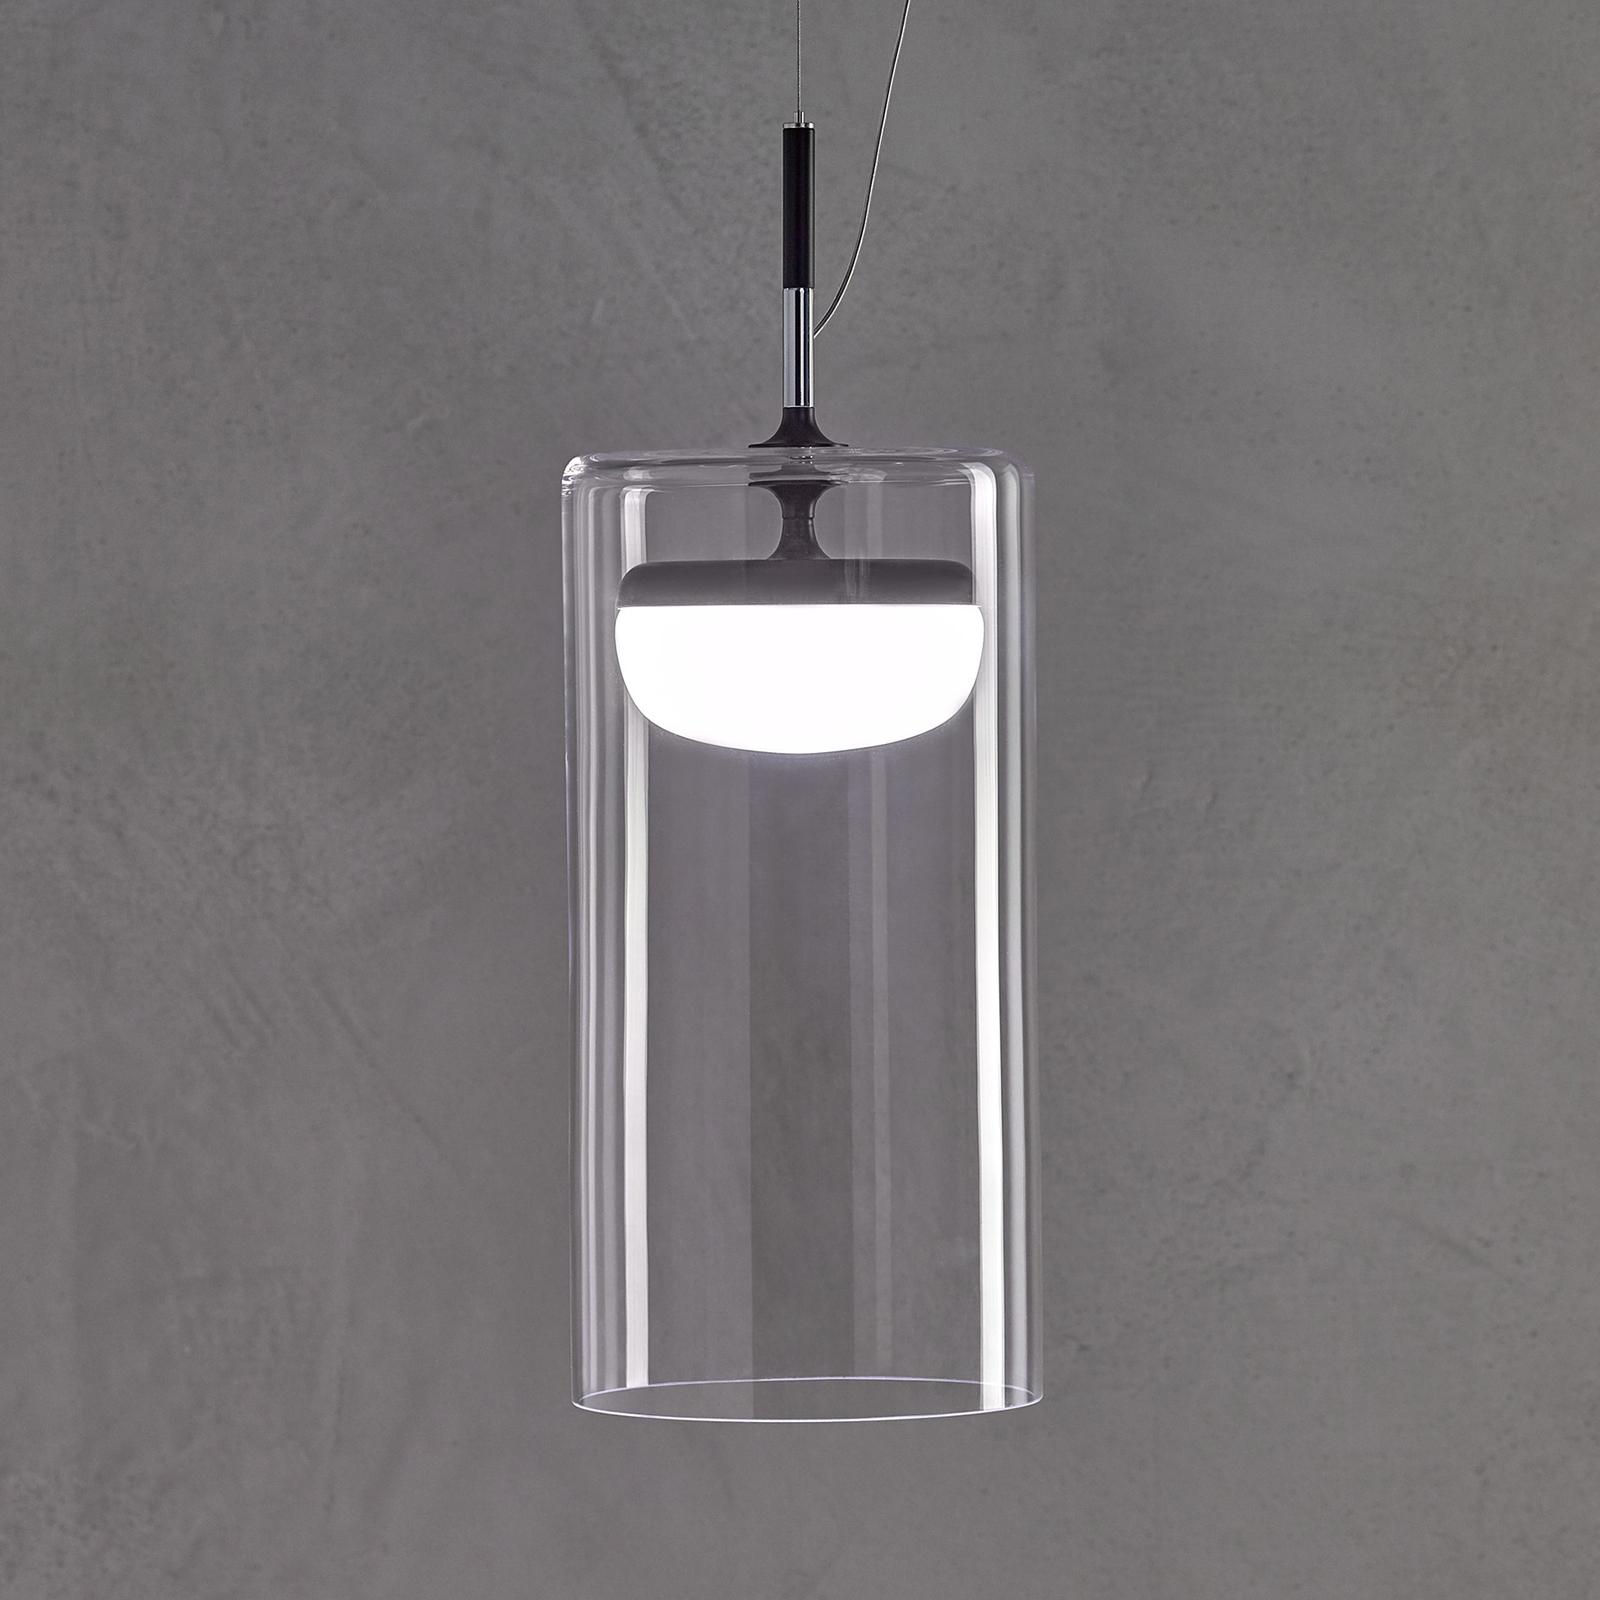 Prandina Diver LED-riippuvalaisin S3 musta